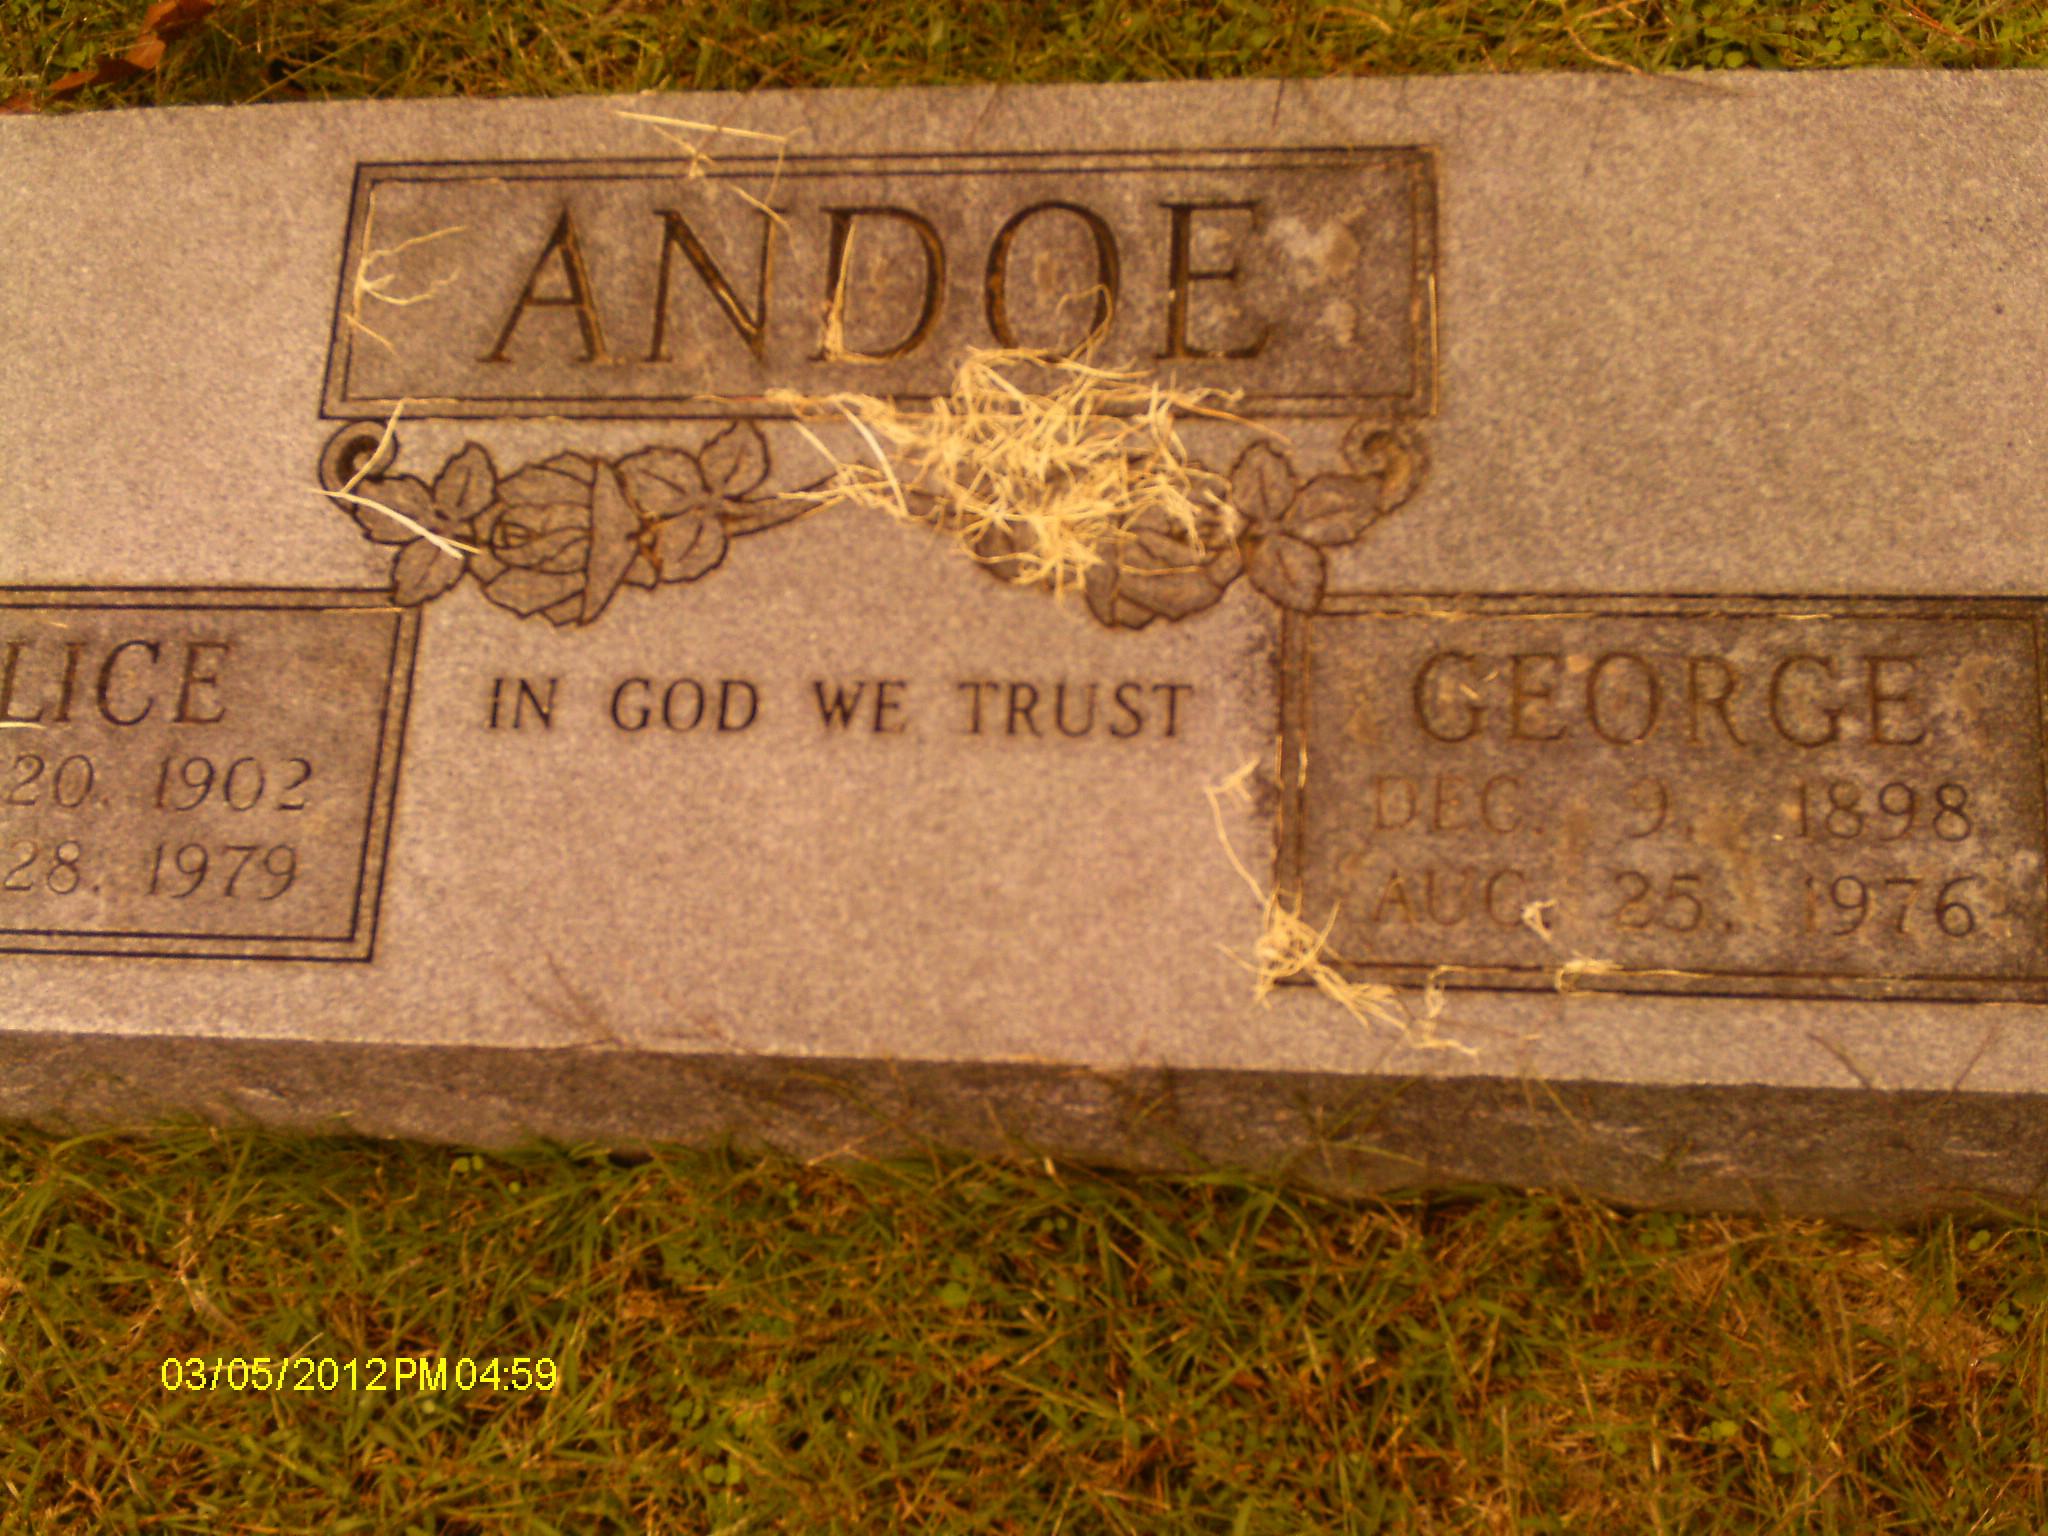 George Dewey Andoe